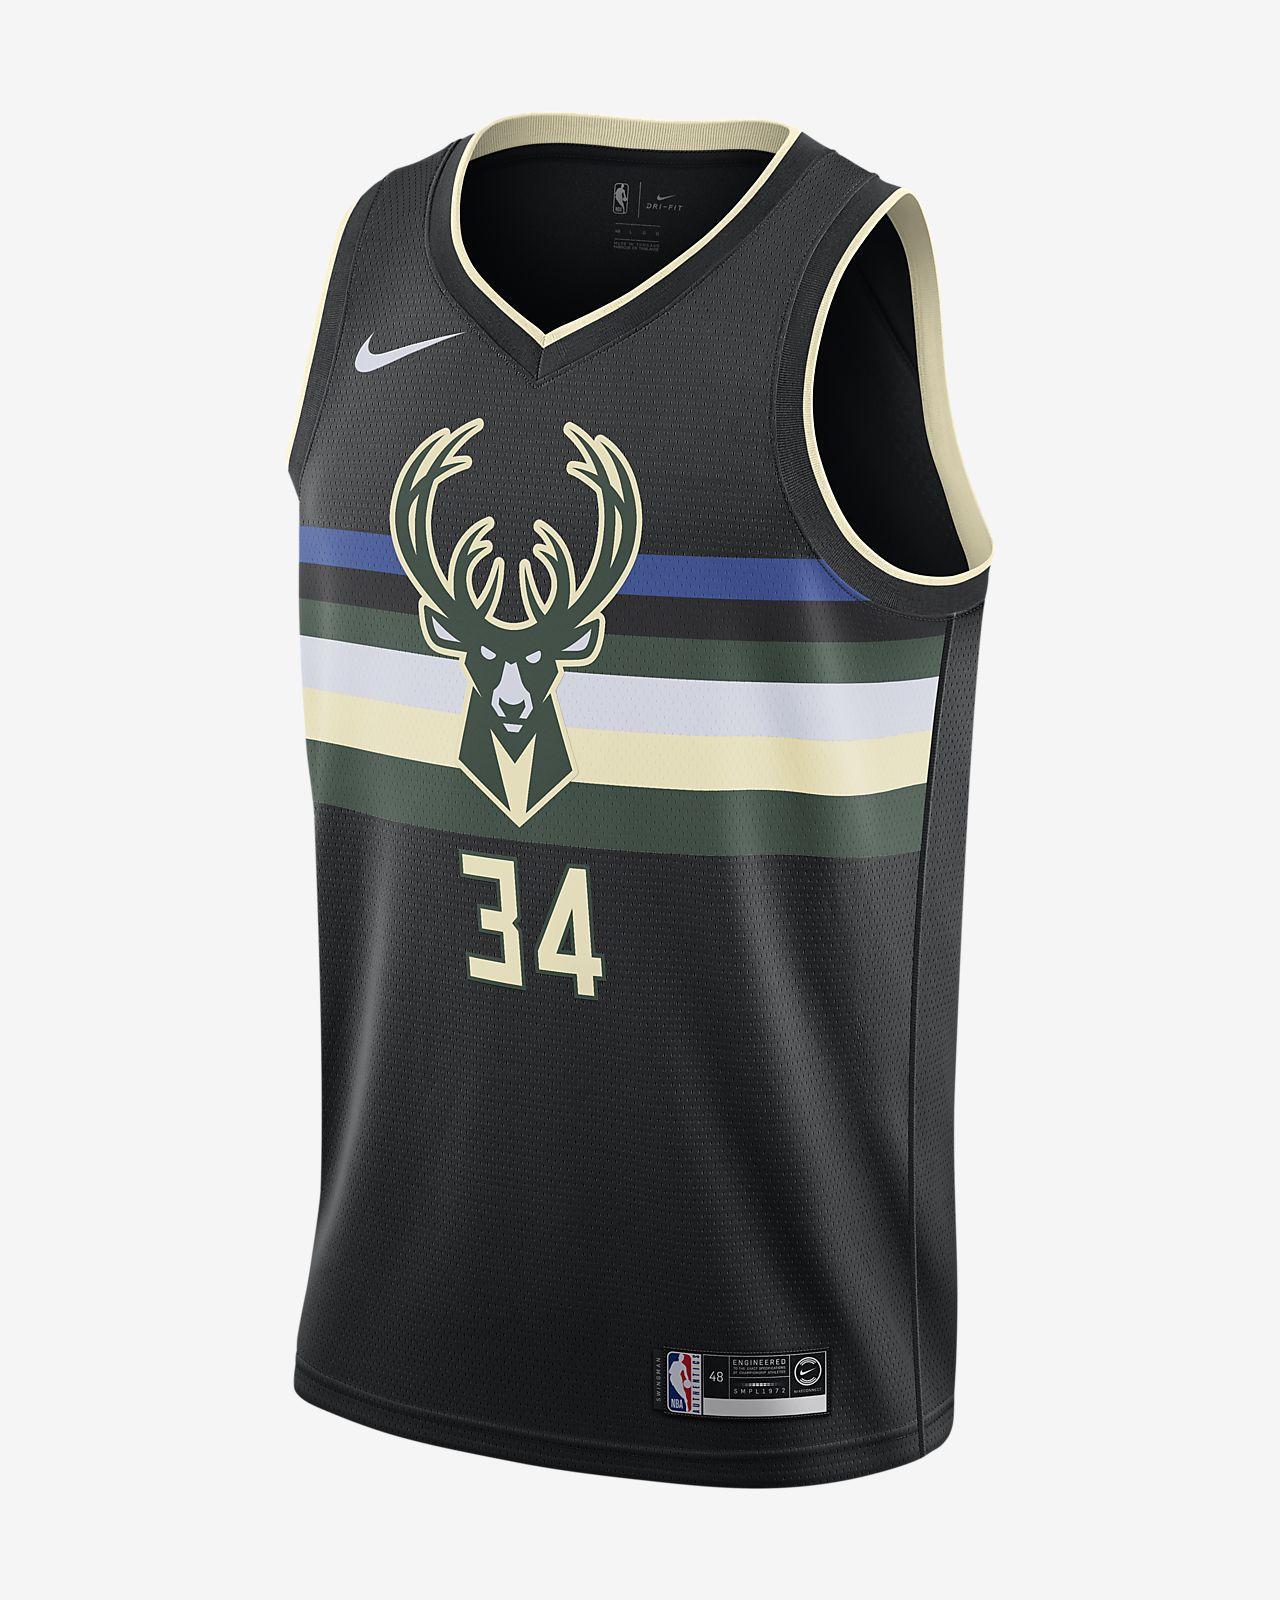 Giannis Antetokounmpo Bucks Statement Edition Nike NBA Swingman Jersey